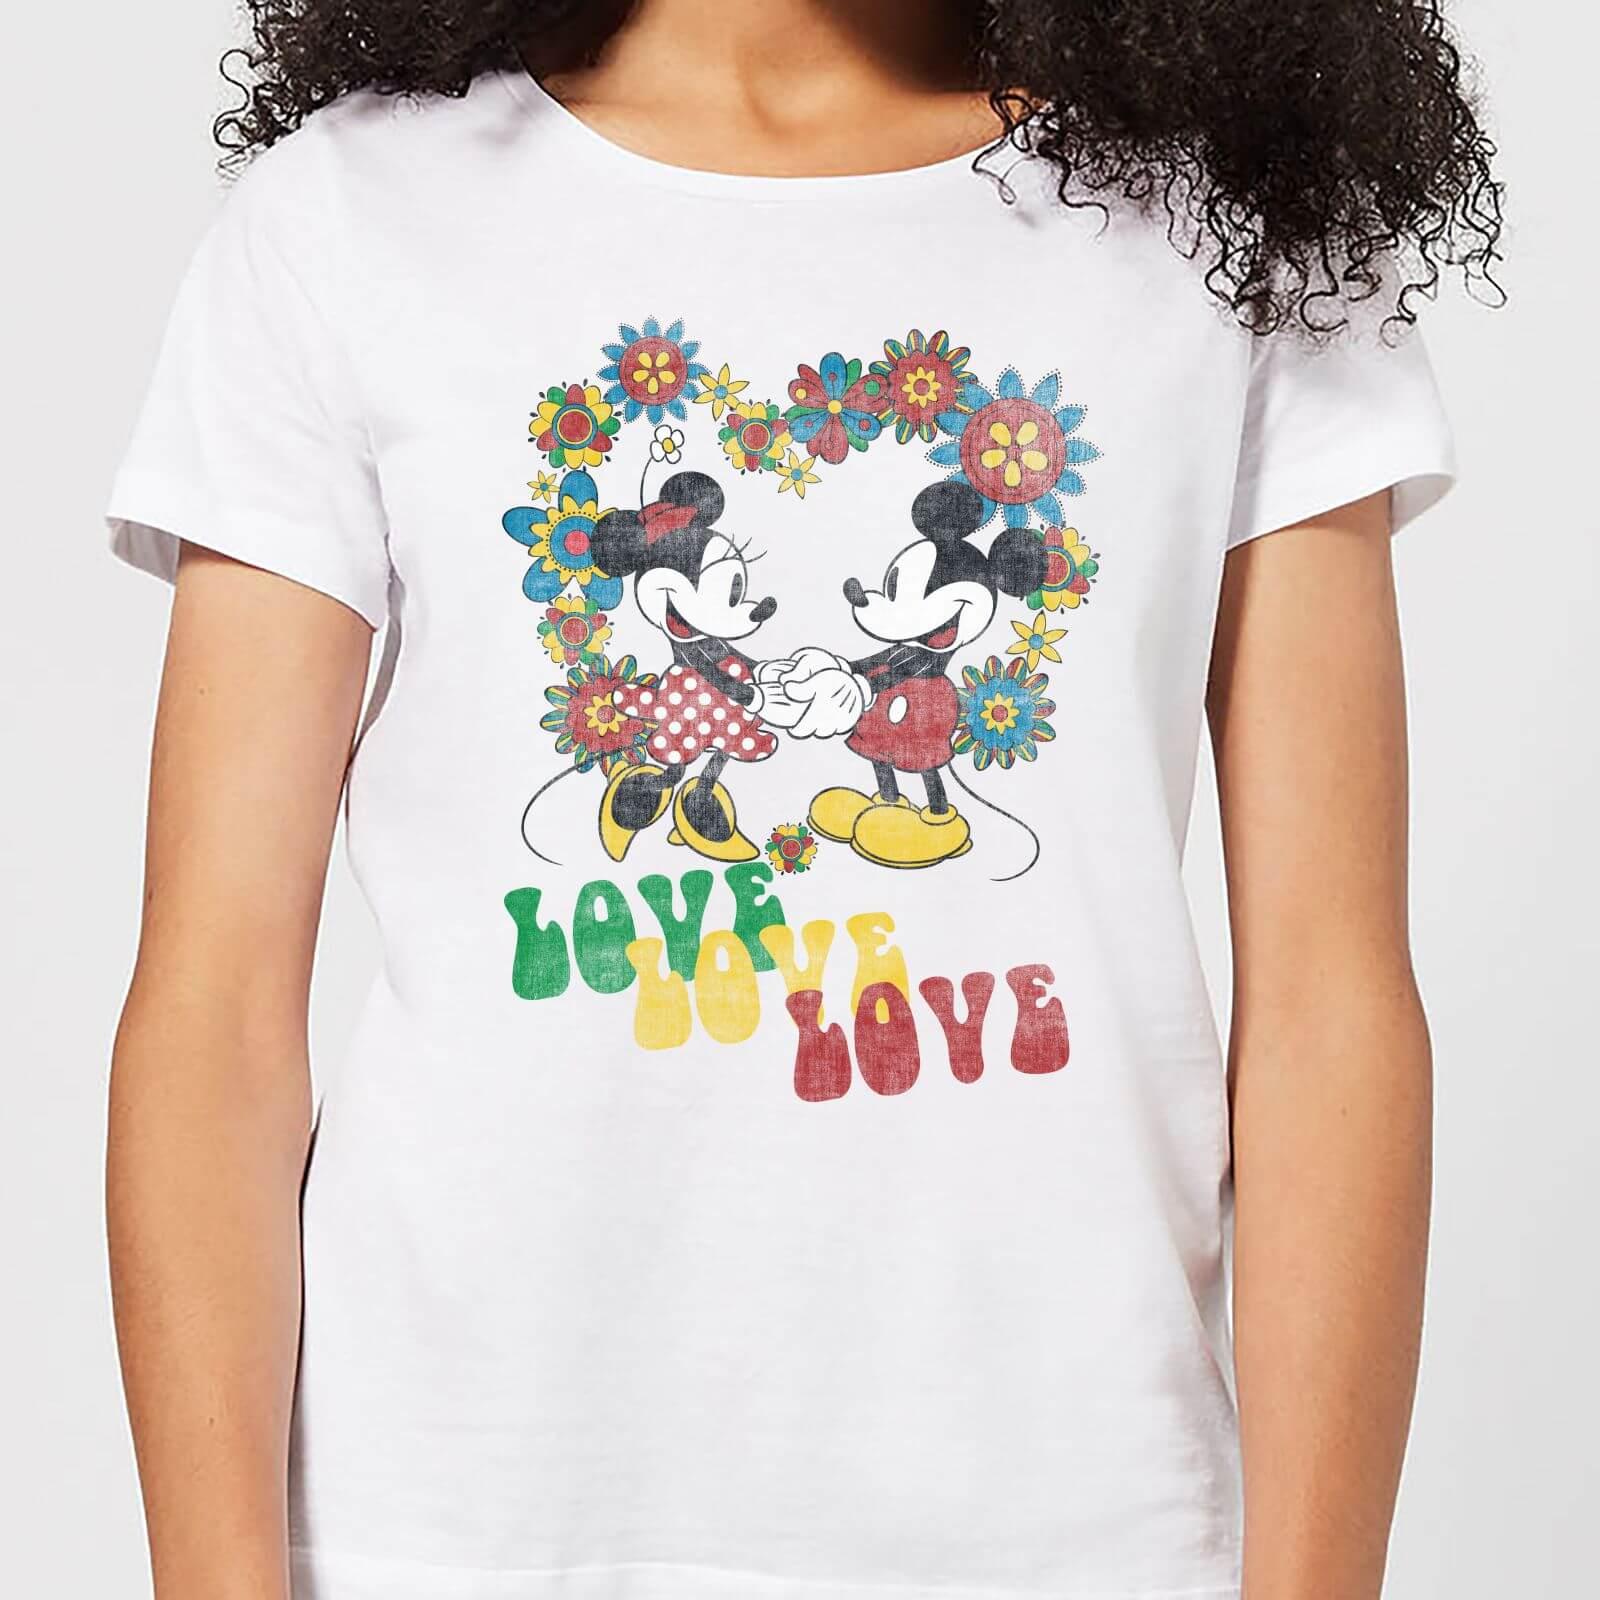 Disney Mickey Mouse Hippie Love Women's T-Shirt - White - S - White